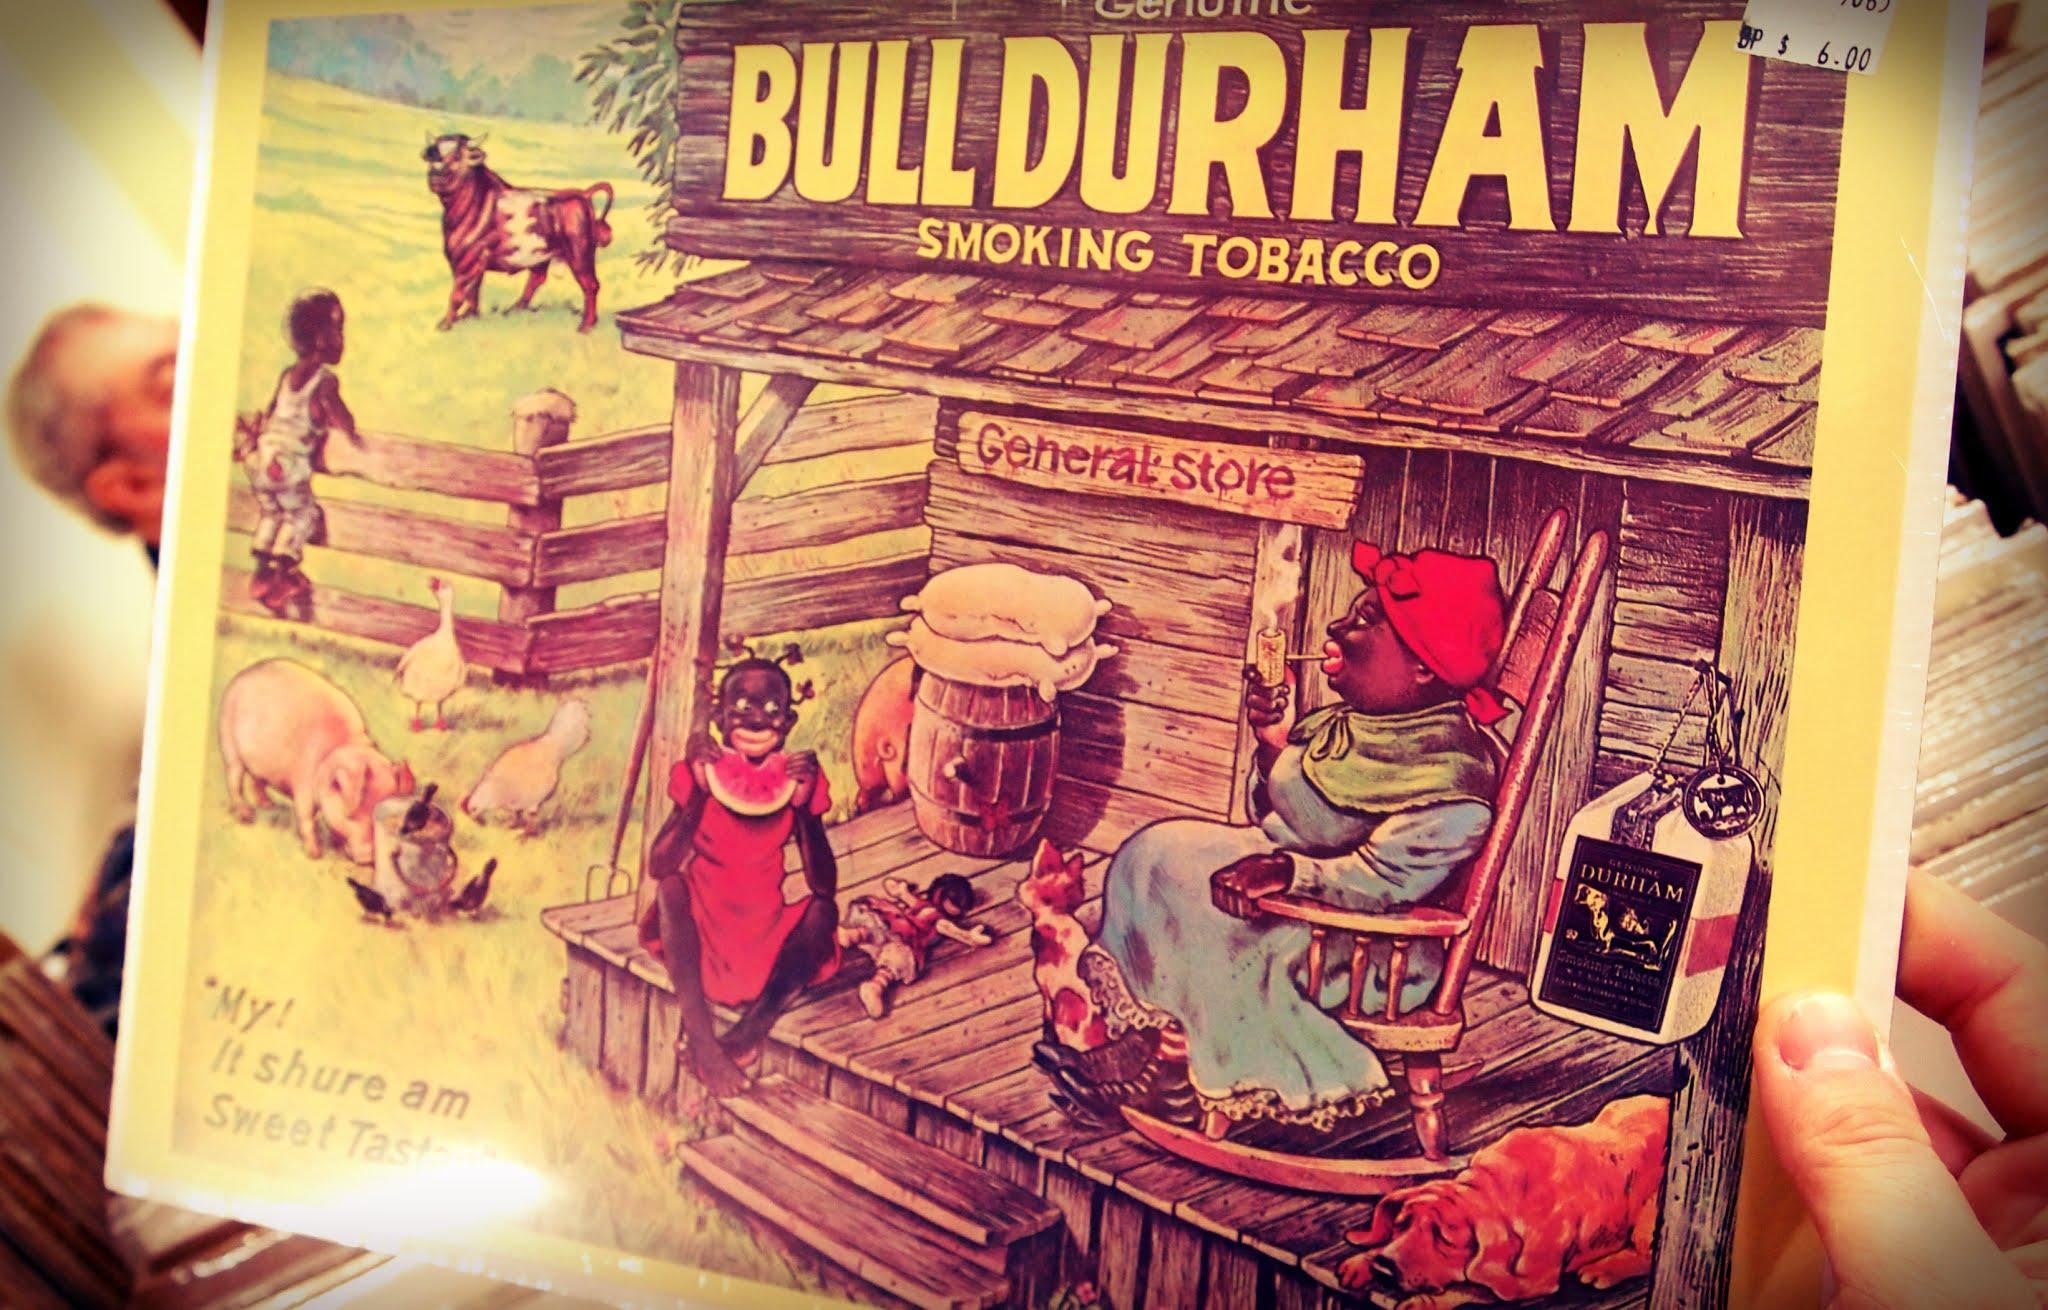 Nashville Flea Market Racist Bull Durham Sign